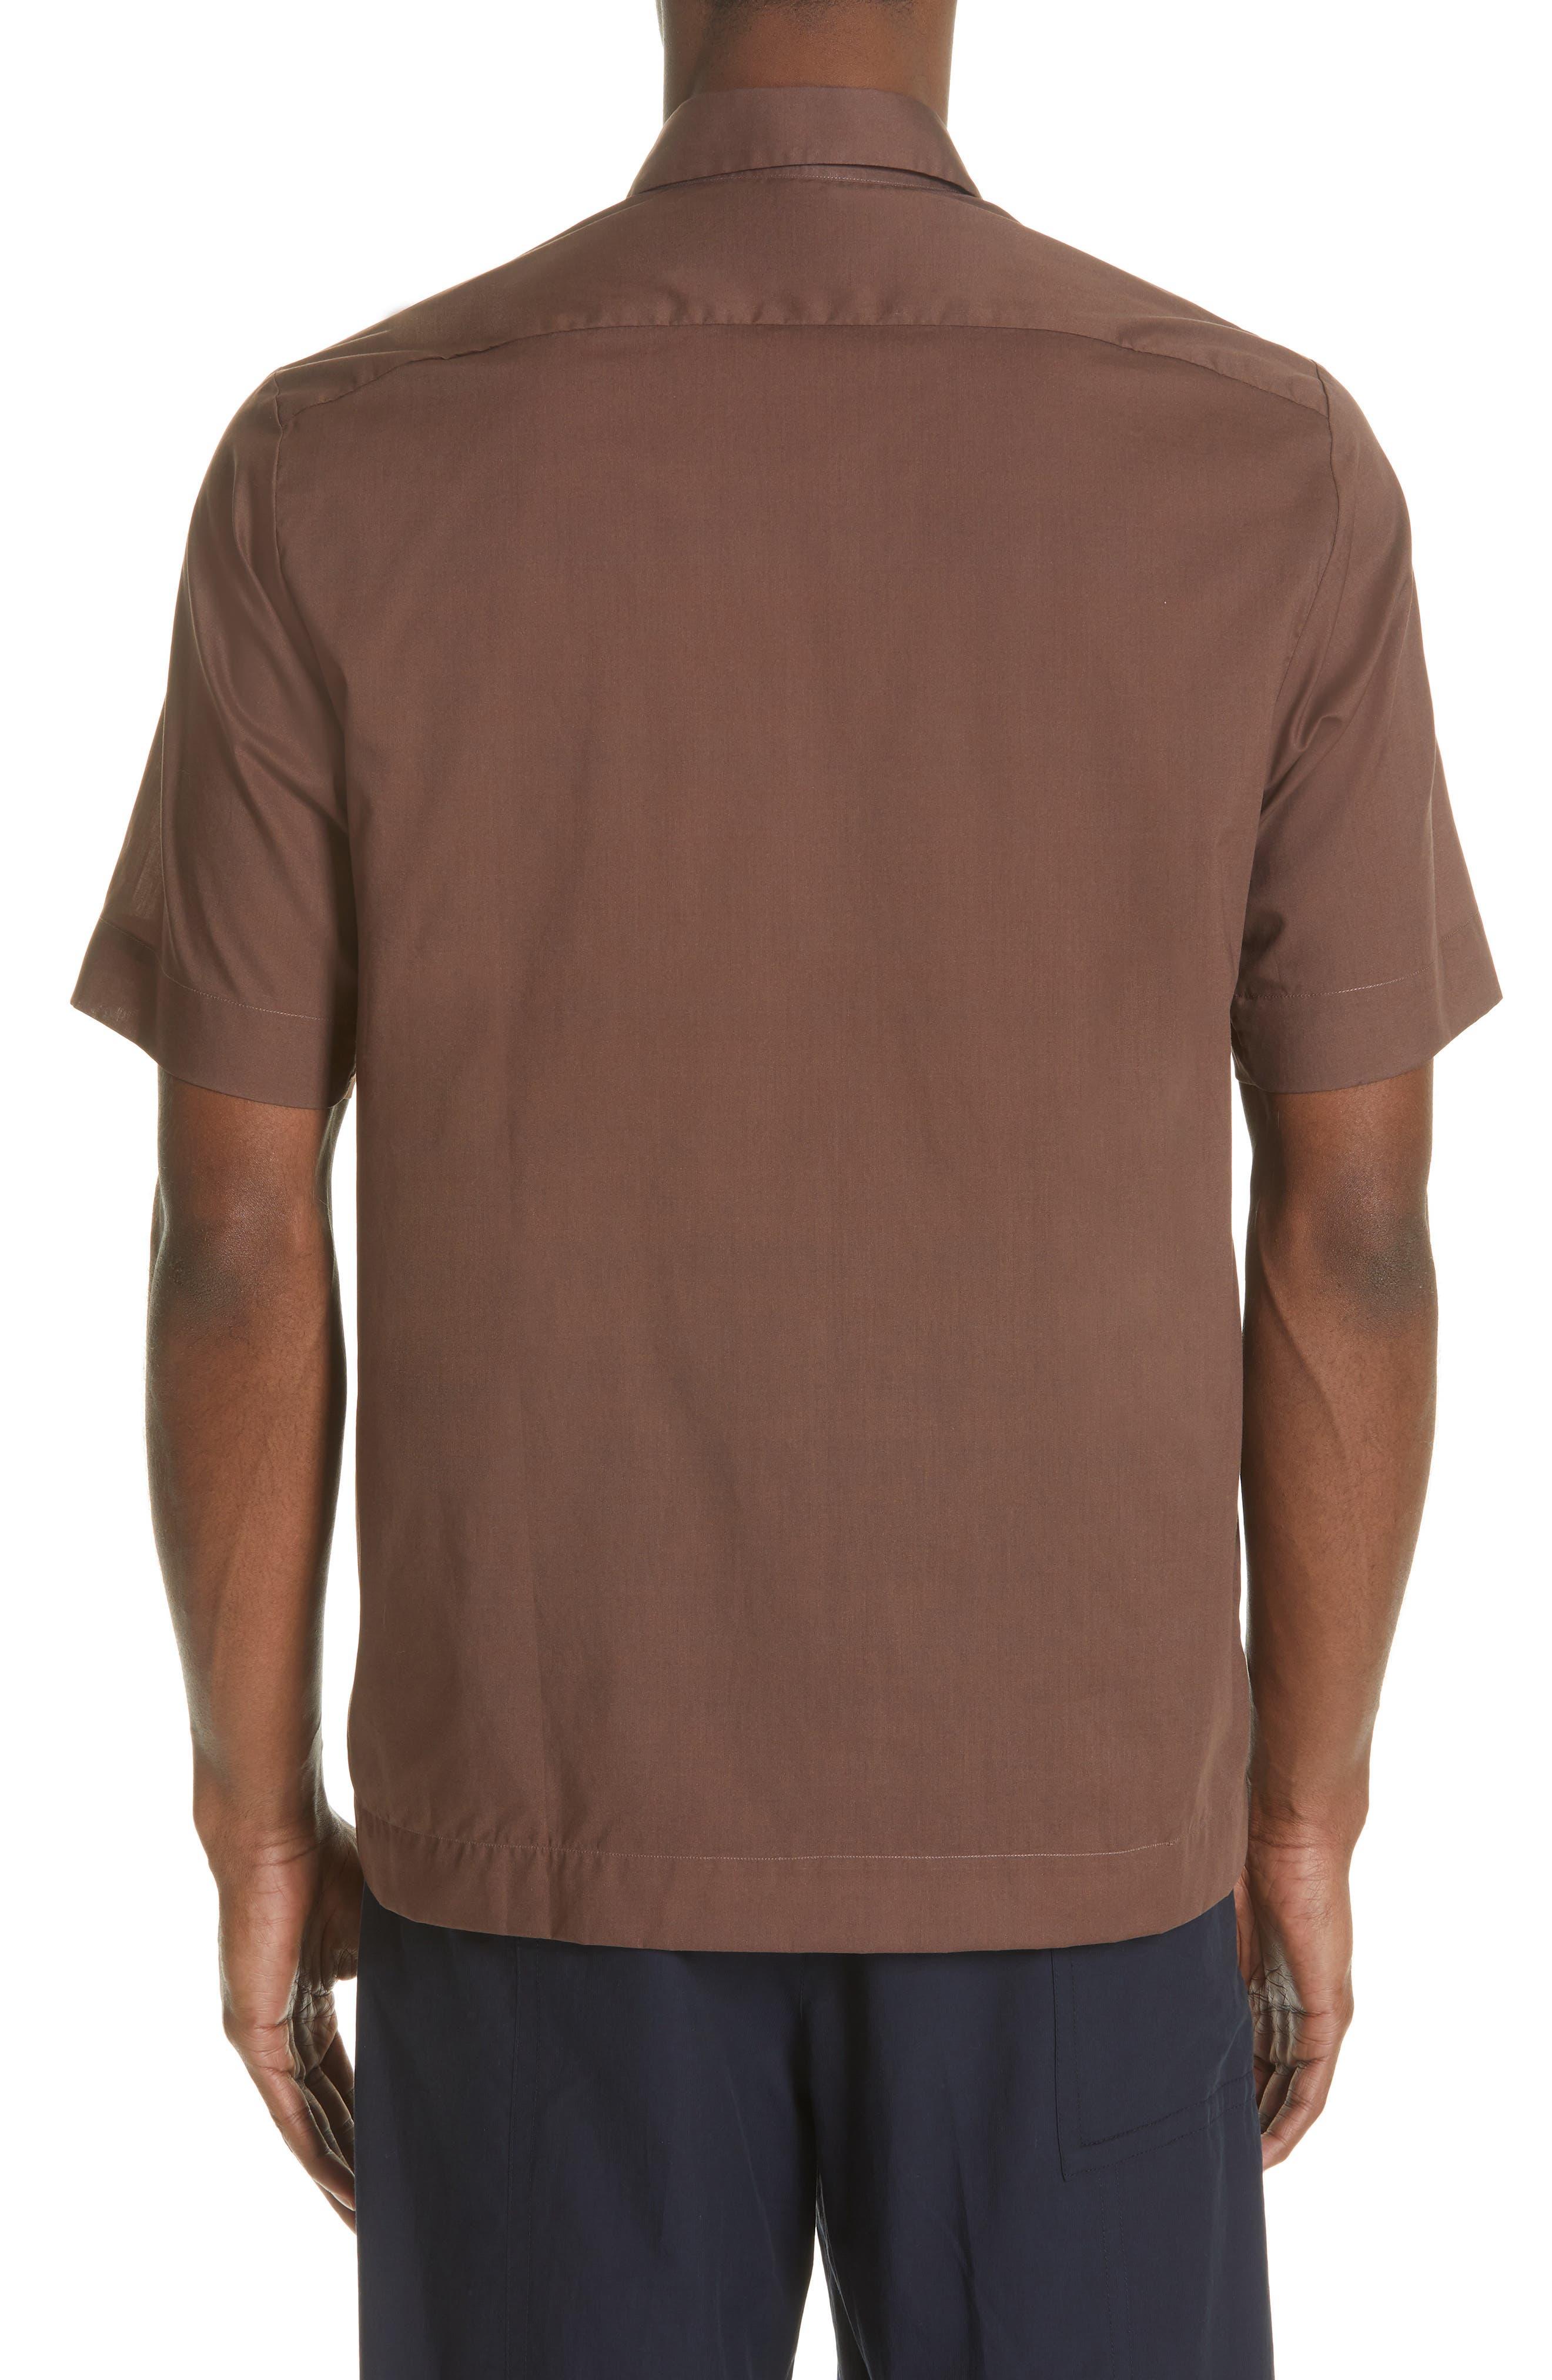 DRIES VAN NOTEN, Clasen Hand Print Shirt, Alternate thumbnail 3, color, BROWN